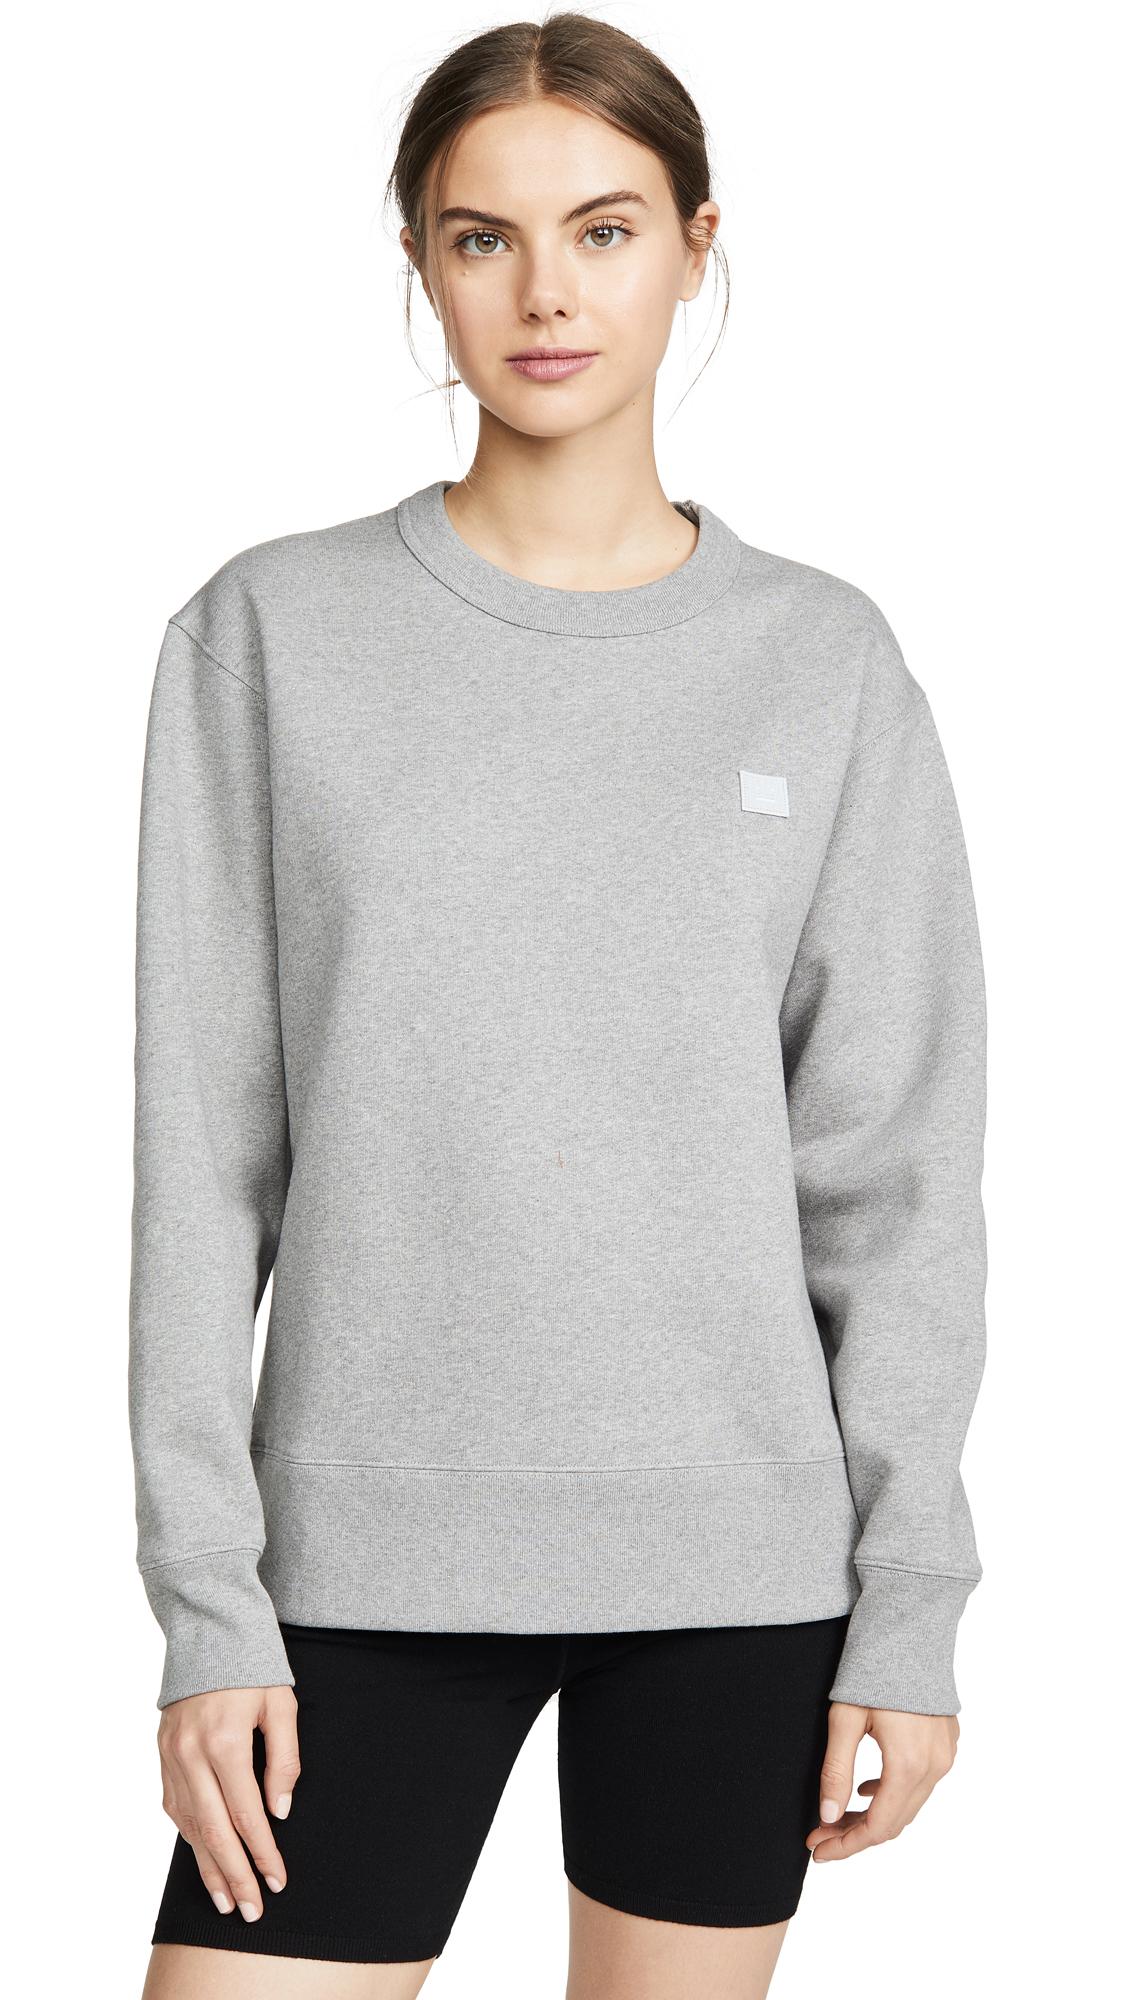 Acne Studios Fairview Face Sweatshirt - Light Grey Melange